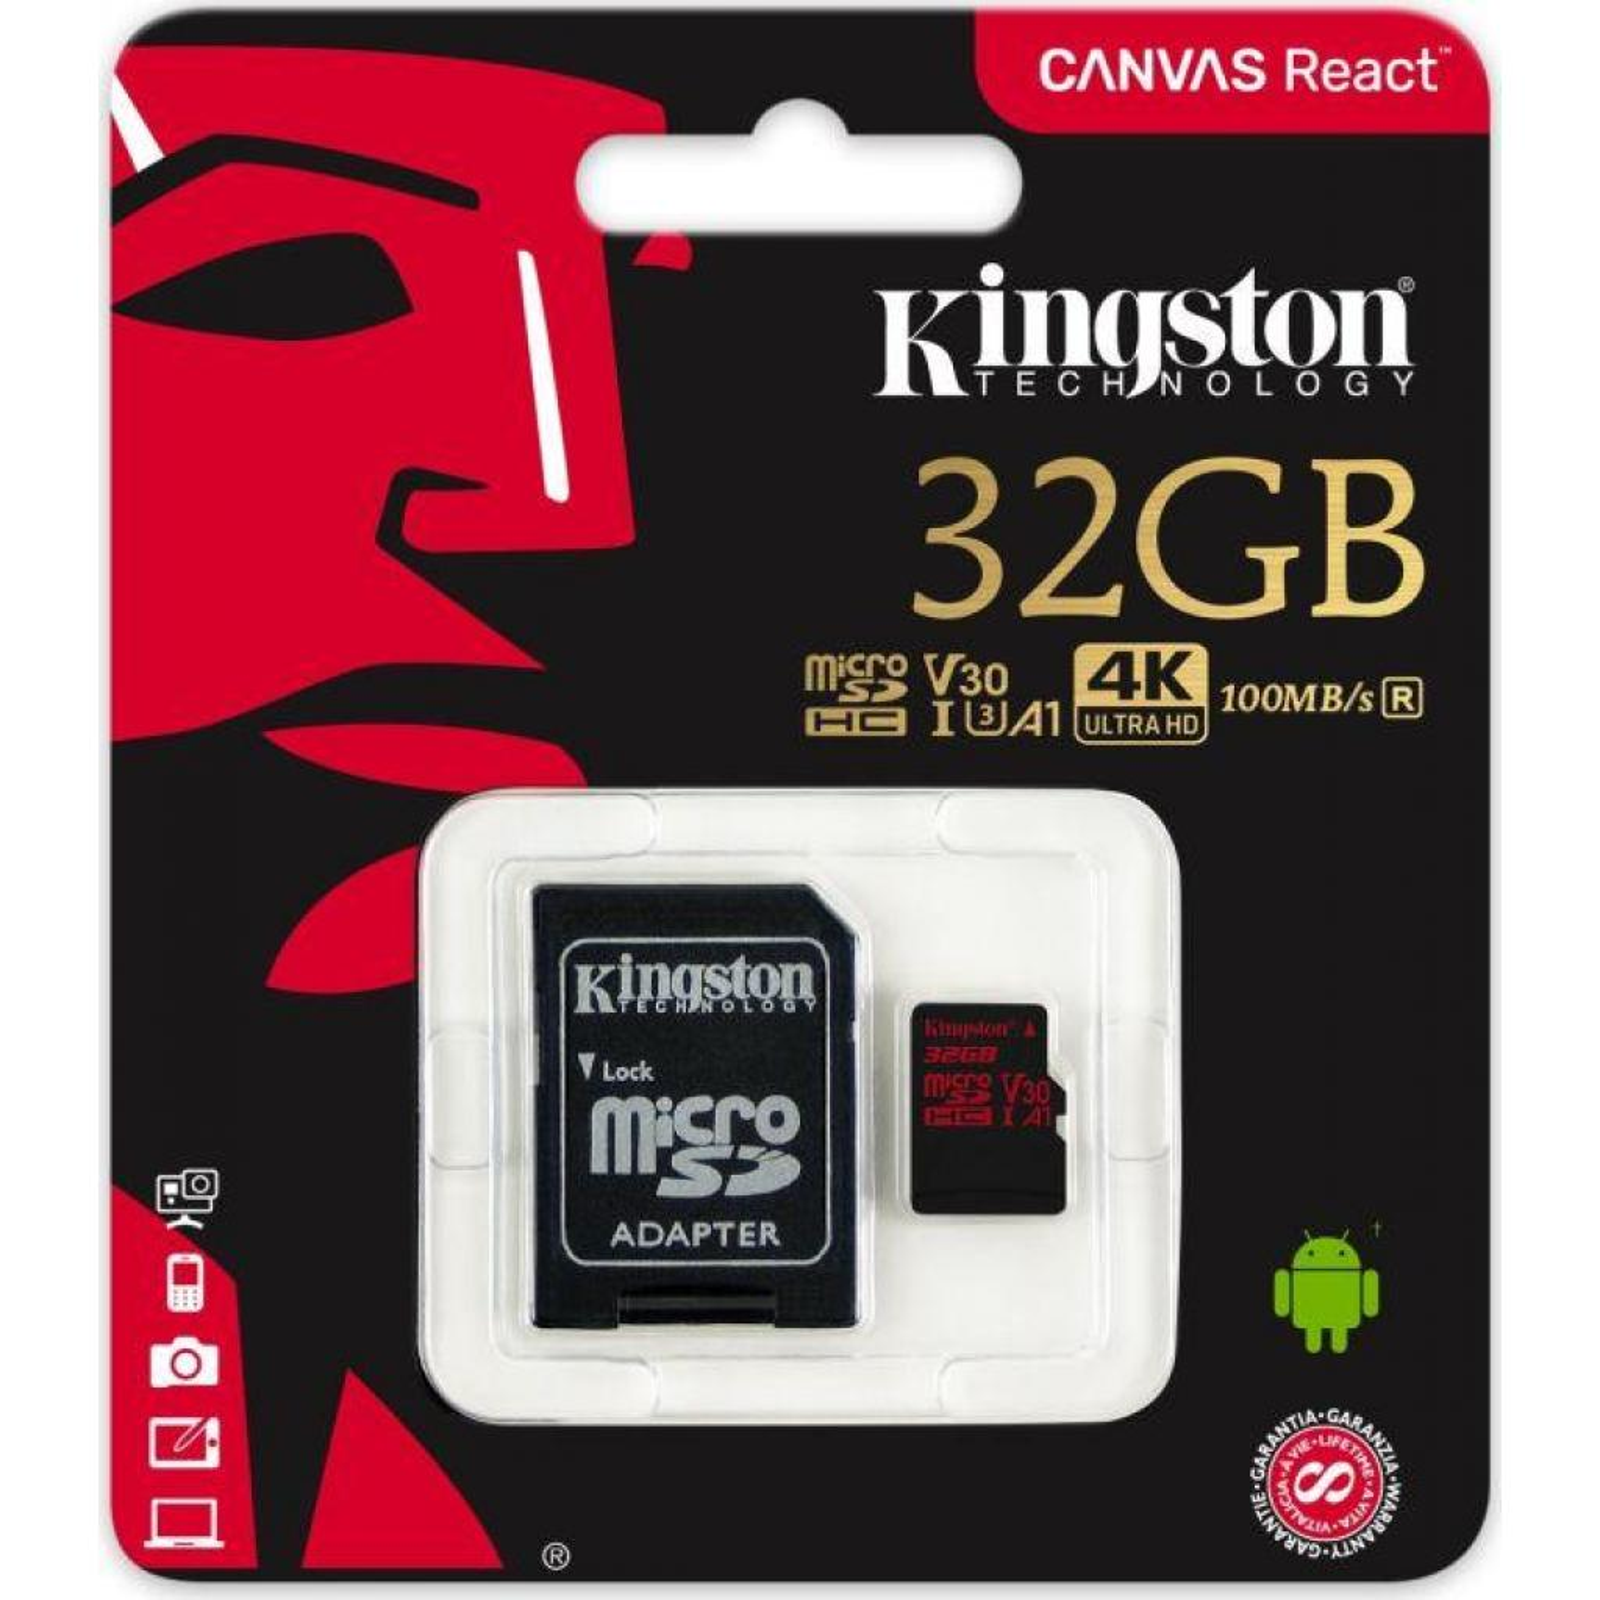 Карта памяти Kingston 32GB microSDHC class 10 UHS-I U3 (SDCR/32GB) изображение 3